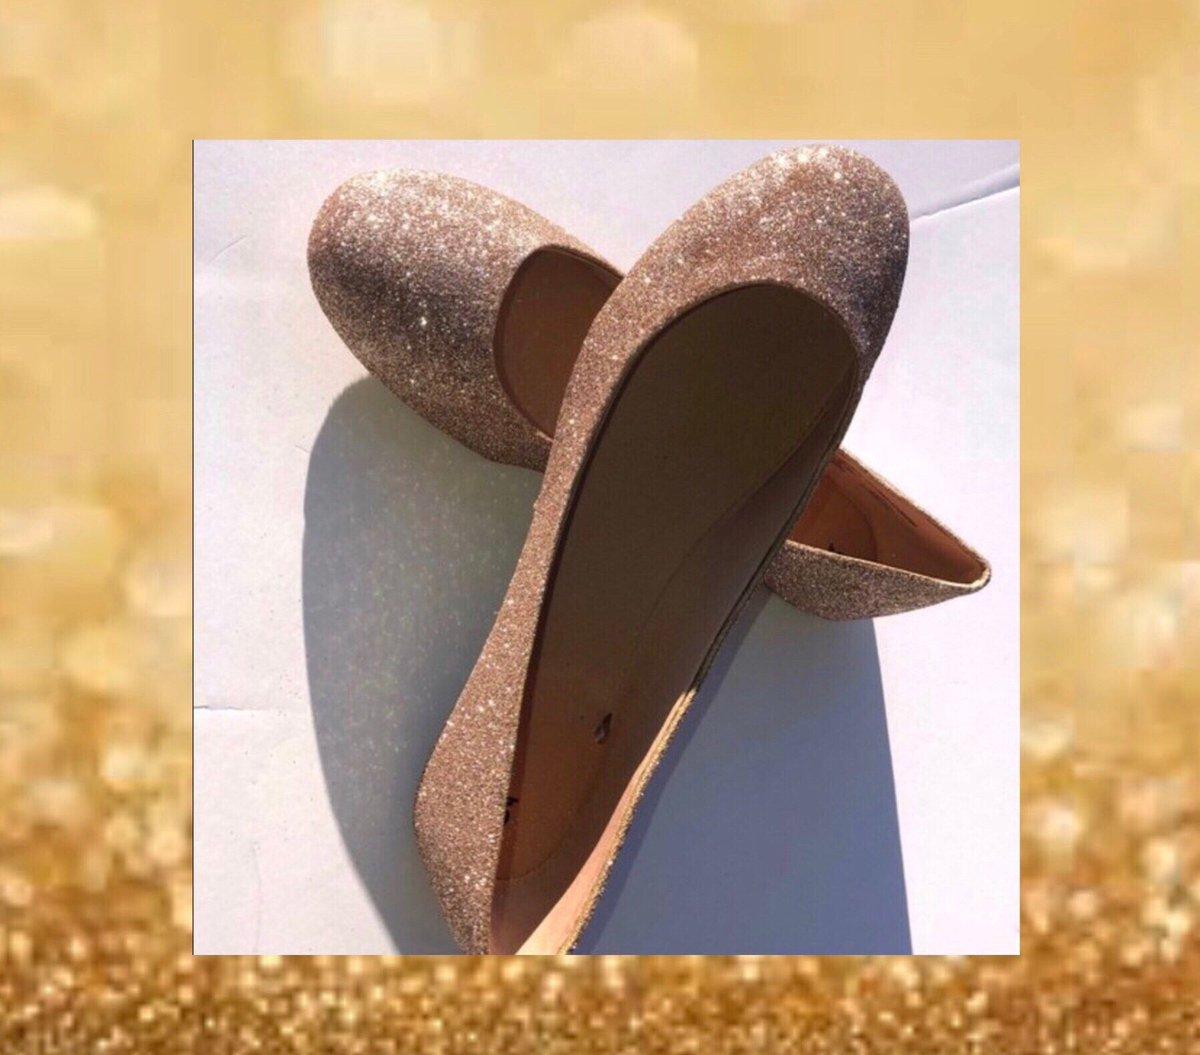 7911b73a4dcc ... Glitter Ballet Flats JCoDanseur Shoes  Free Shipping   women  shoes   gold  wedding  mothersday  bridesmaidflats https   etsy.me 2LO3IdP pic. twitter.com  ...